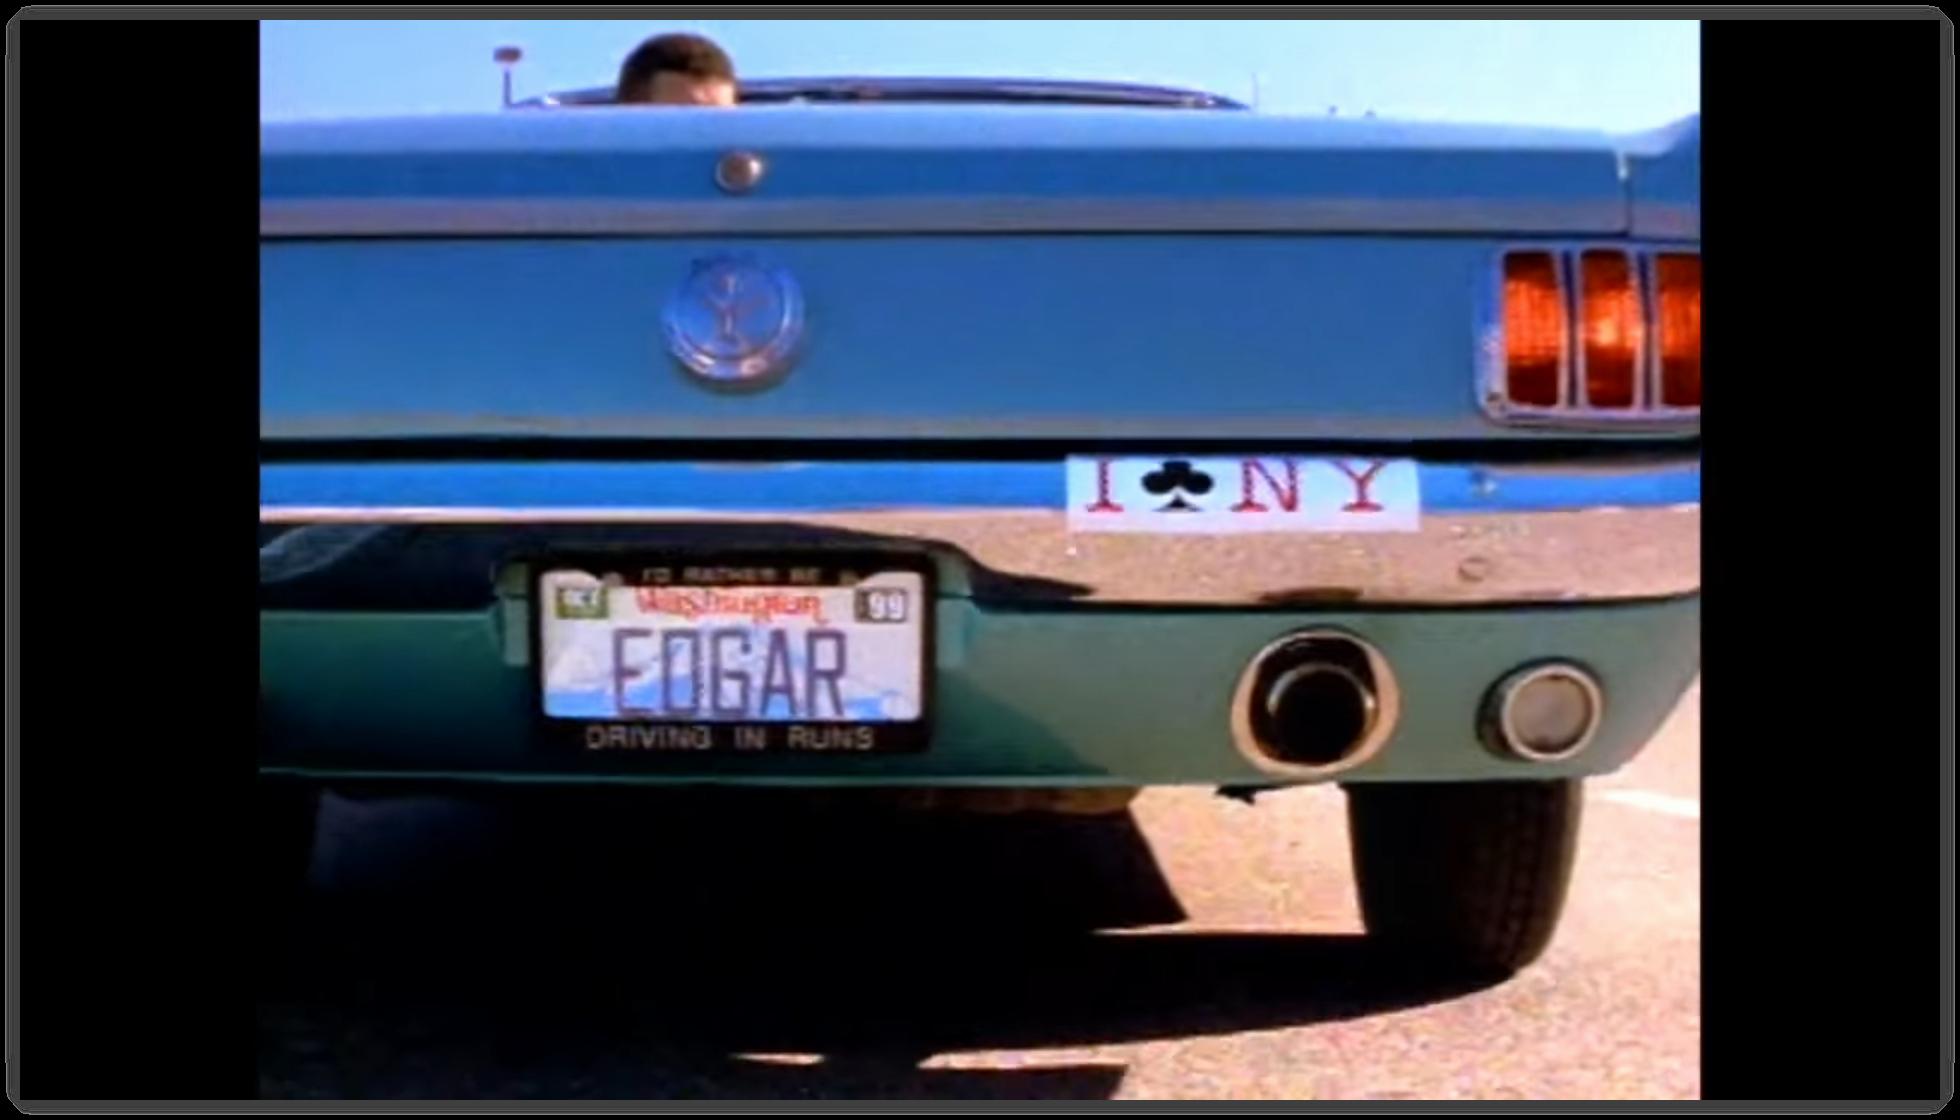 Edgar's convertible